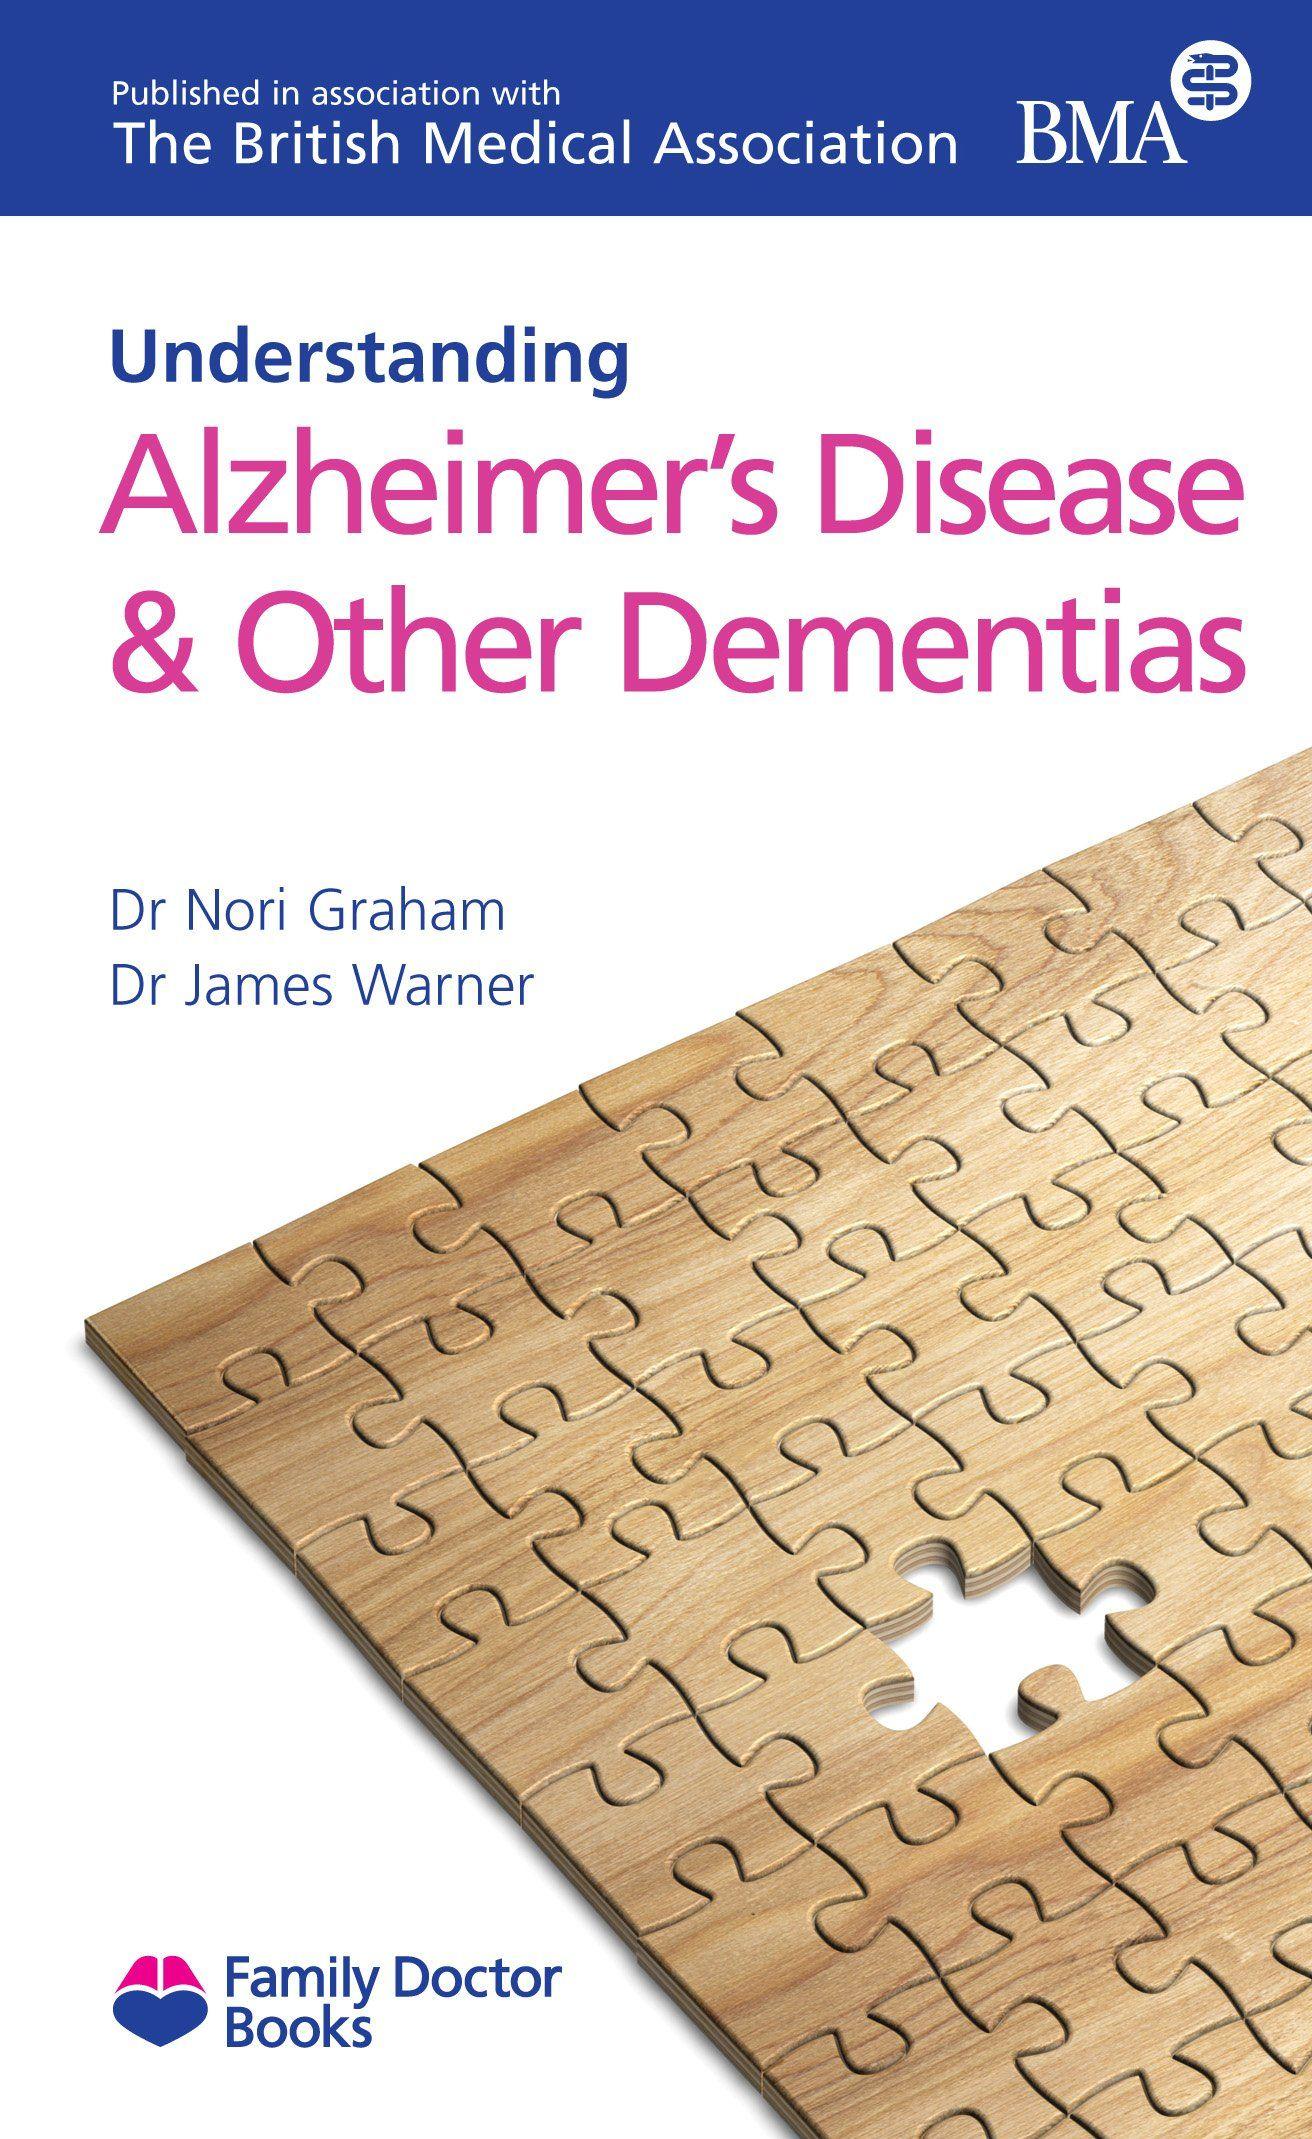 Pin on Dementia Prevention